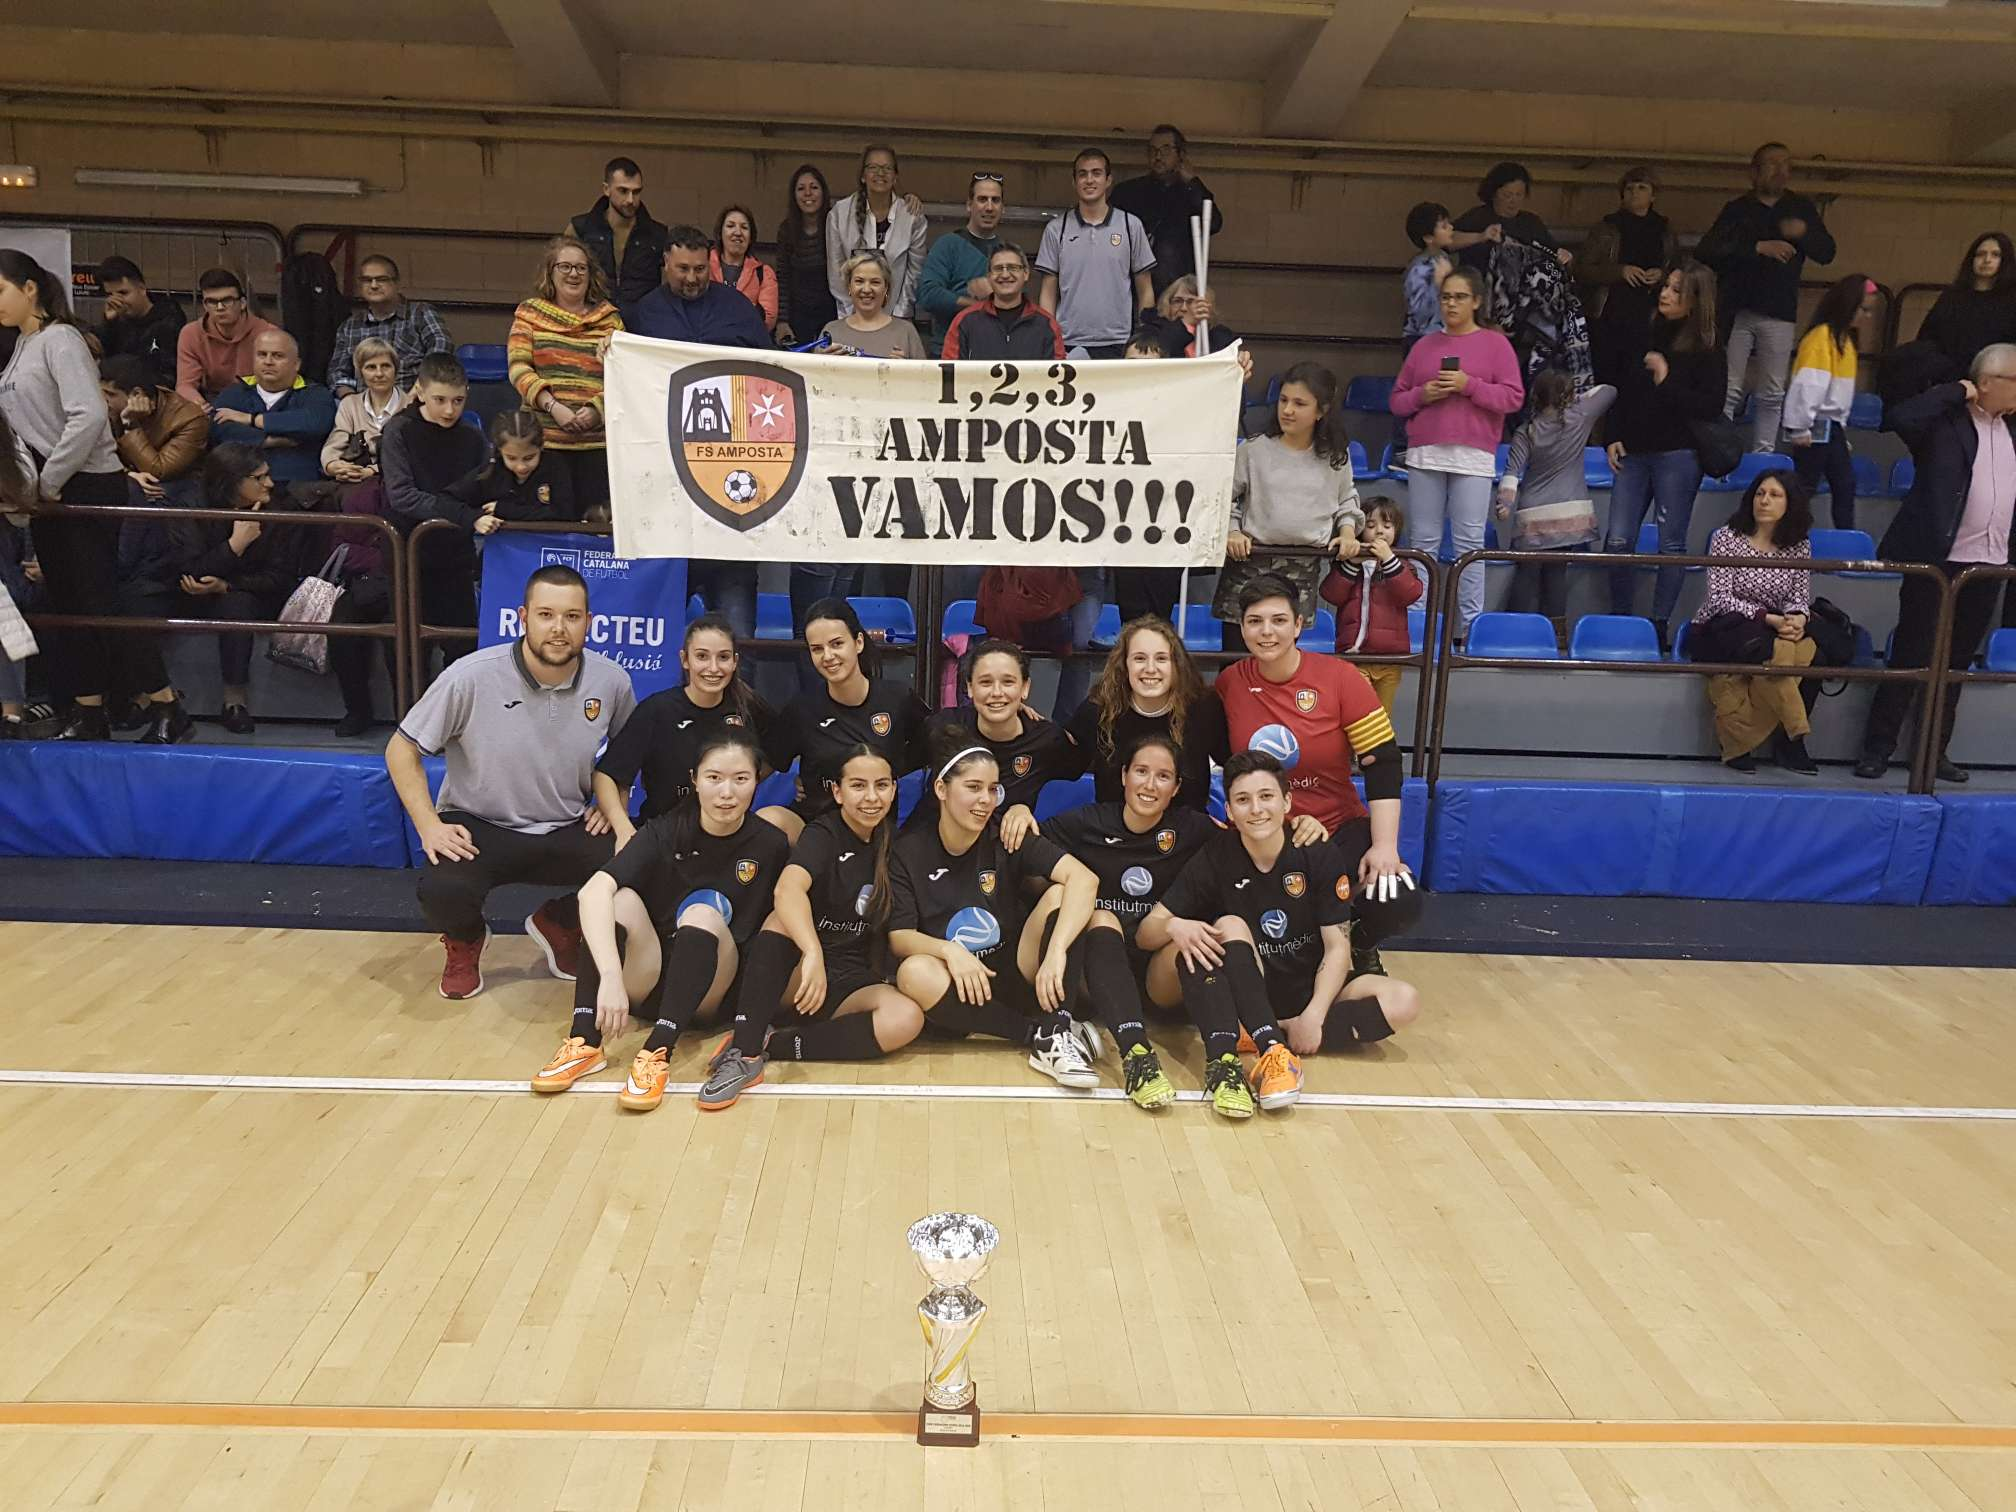 Campiones Sènior femení Copa Tarragona - Amposta FS